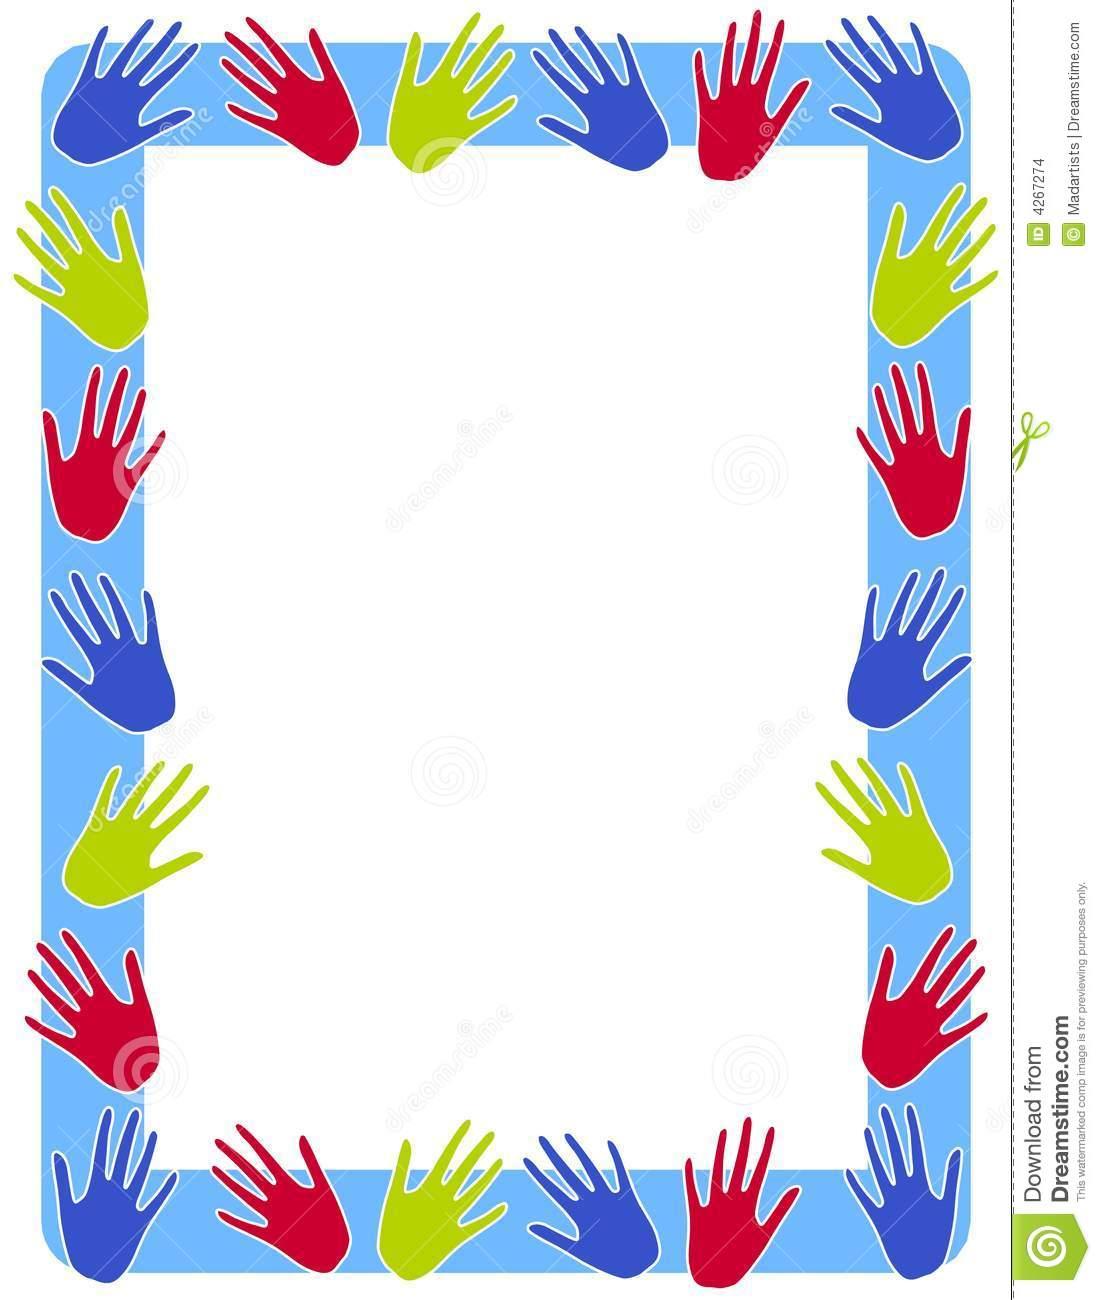 Hand Print Border Clip Art Clipart Panda